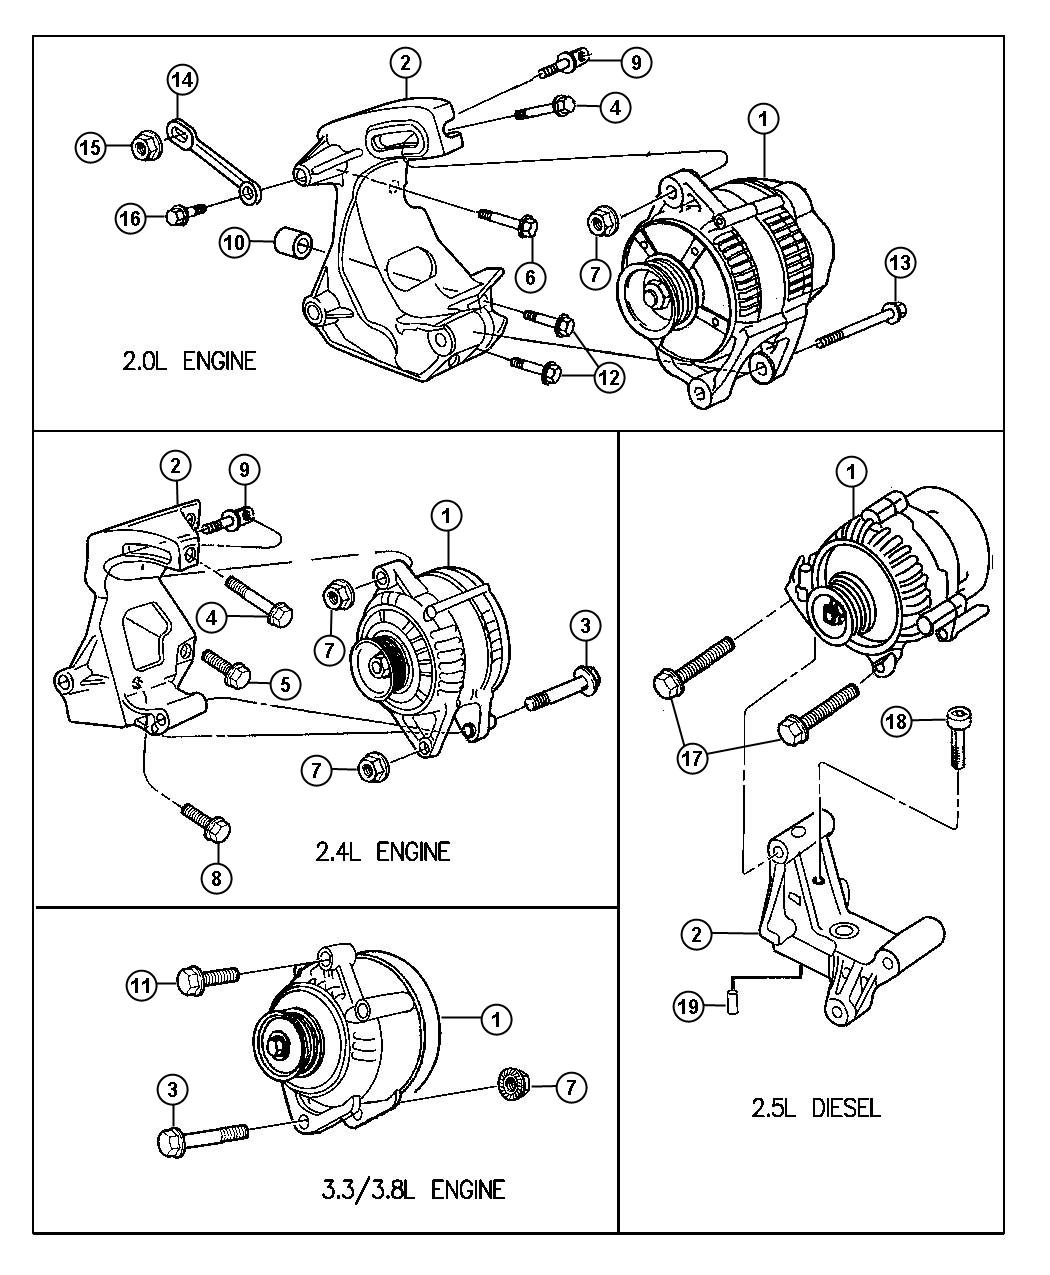 Plymouth Voyager Screw. Hex head. M8x1.25x20. I/p floor